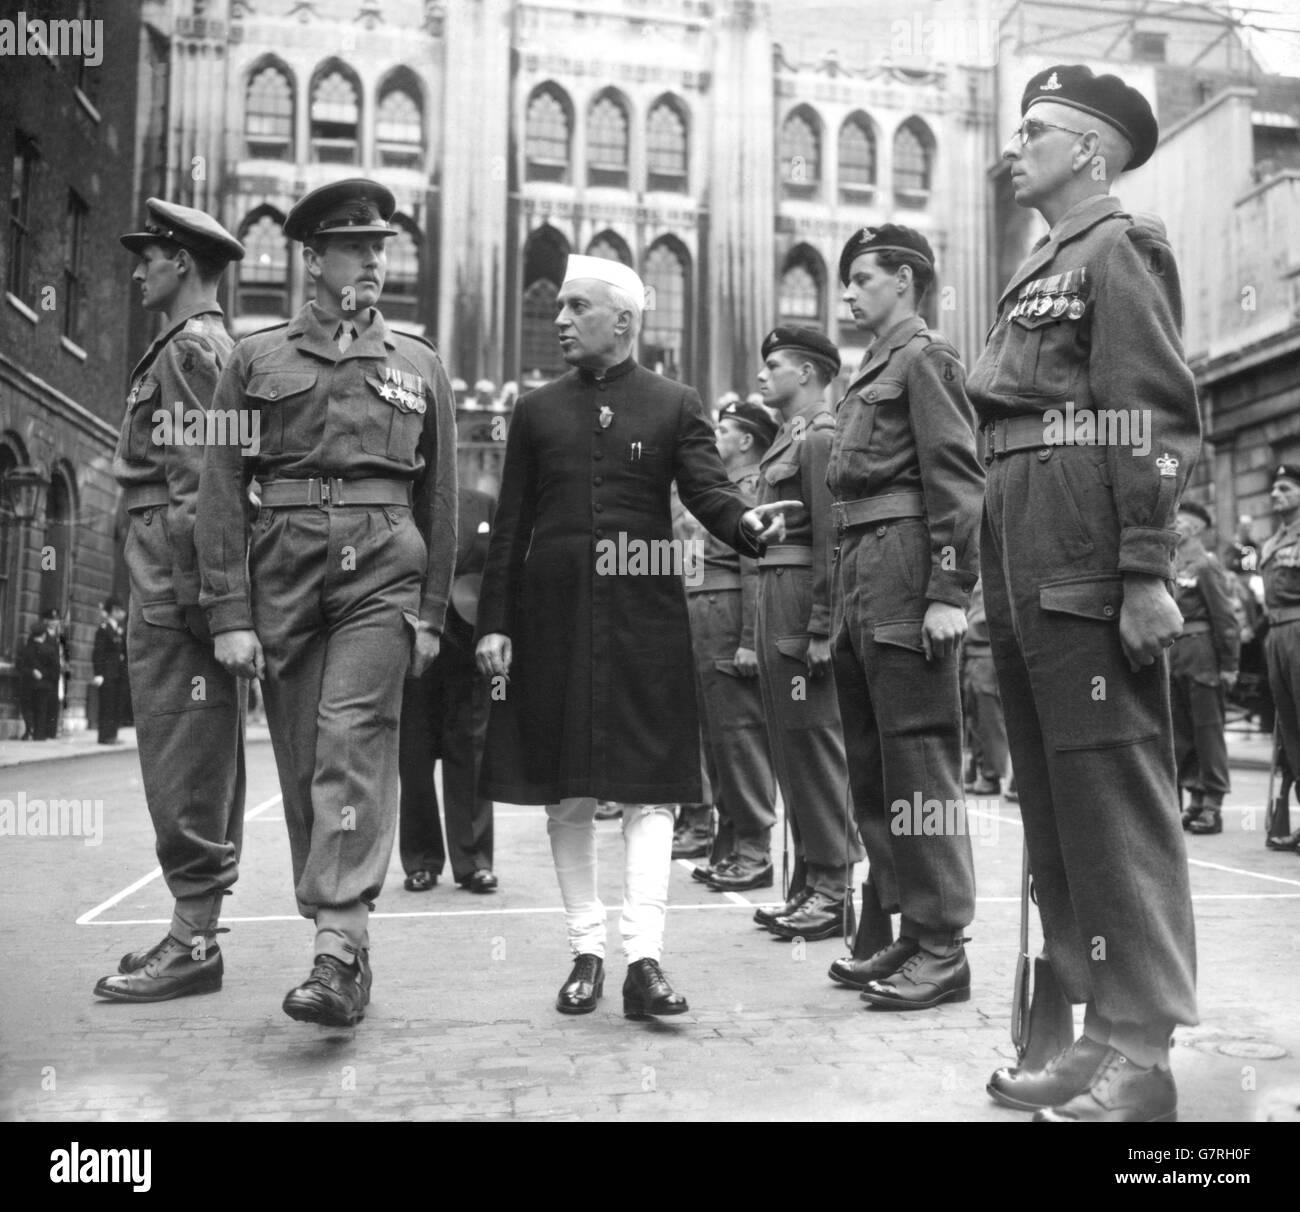 Politics - Indian Prime Minister - Pandit Jawaharlal Nehru - Freedom of the City - London - Stock Image